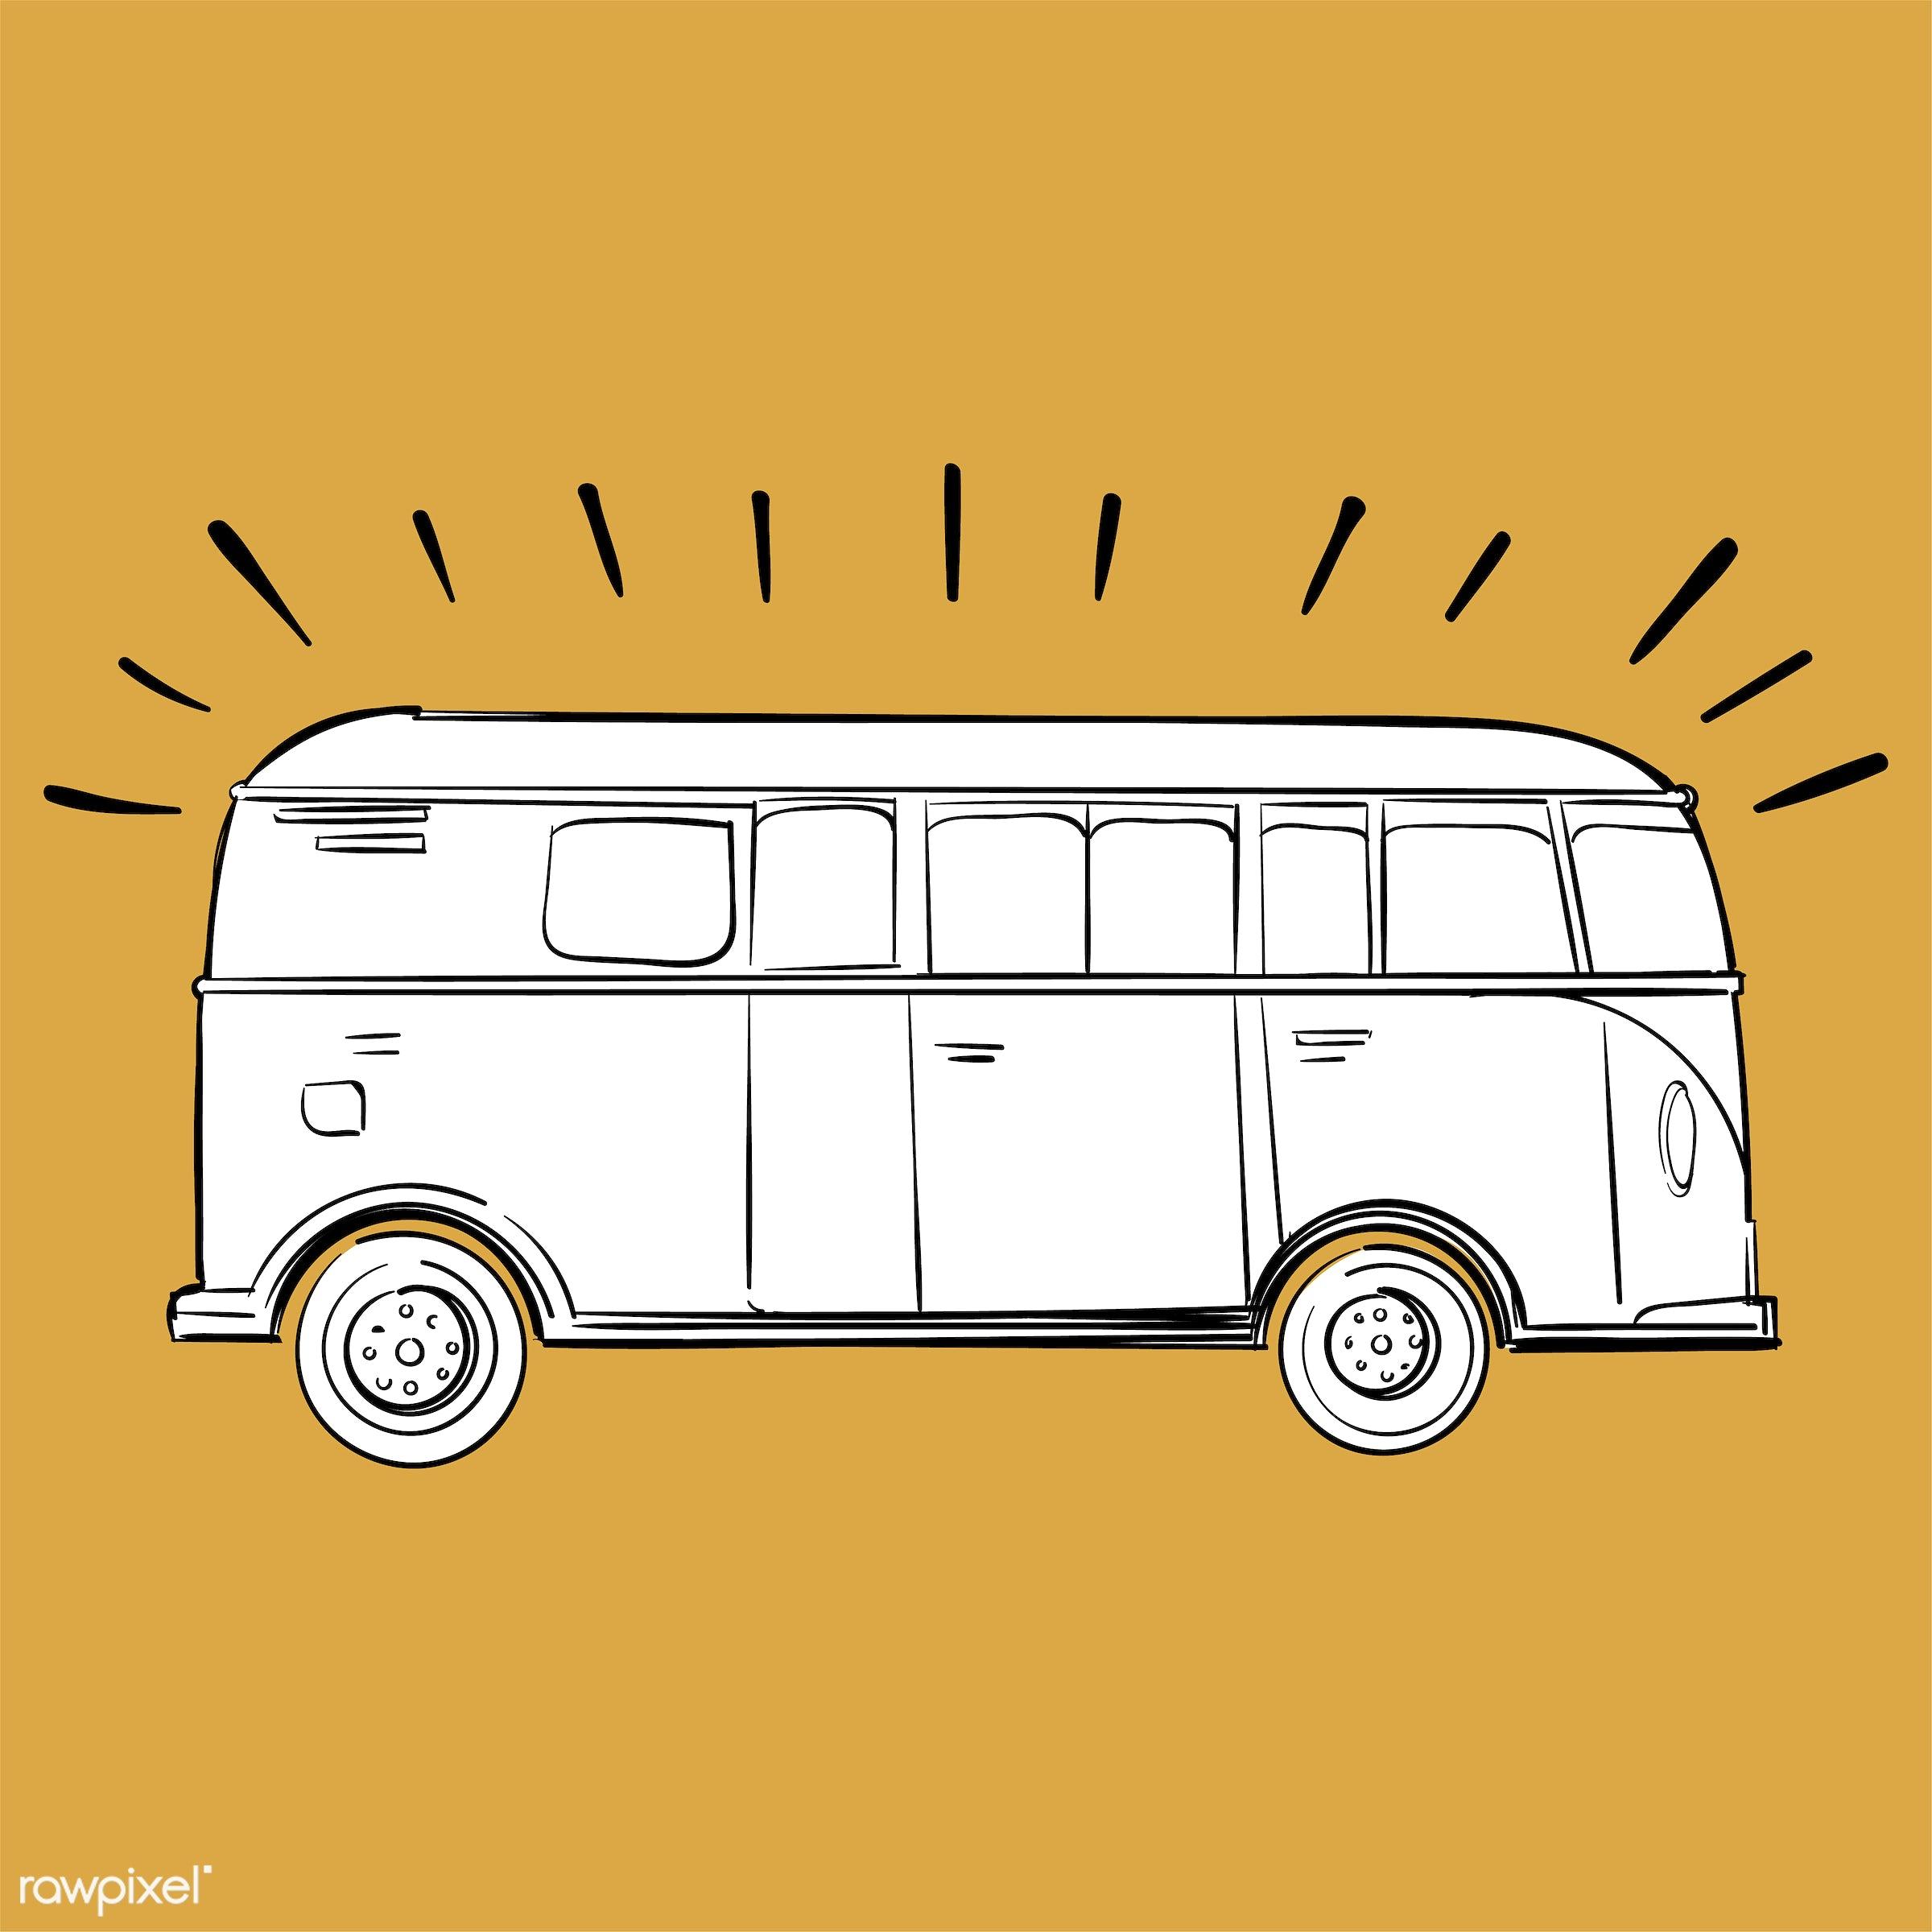 Hand drawing illustration set of wanderlust icons - adventure, art, artwork, bus, camp, camping, car, creative, creativity,...